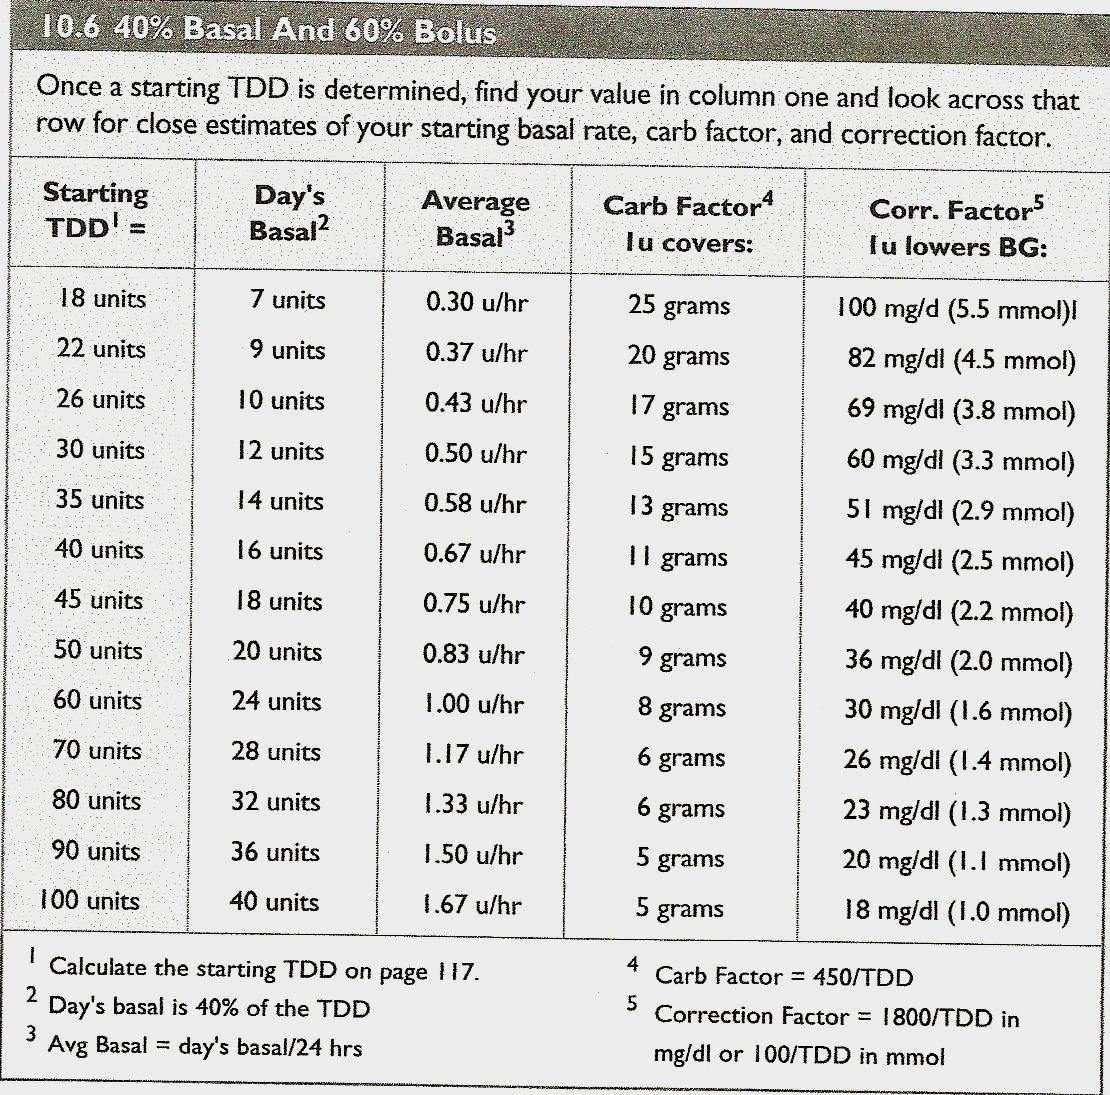 28 Day Medication Expiration Date Chart :-Free Calendar 30 Day Calendar For Med Expiration